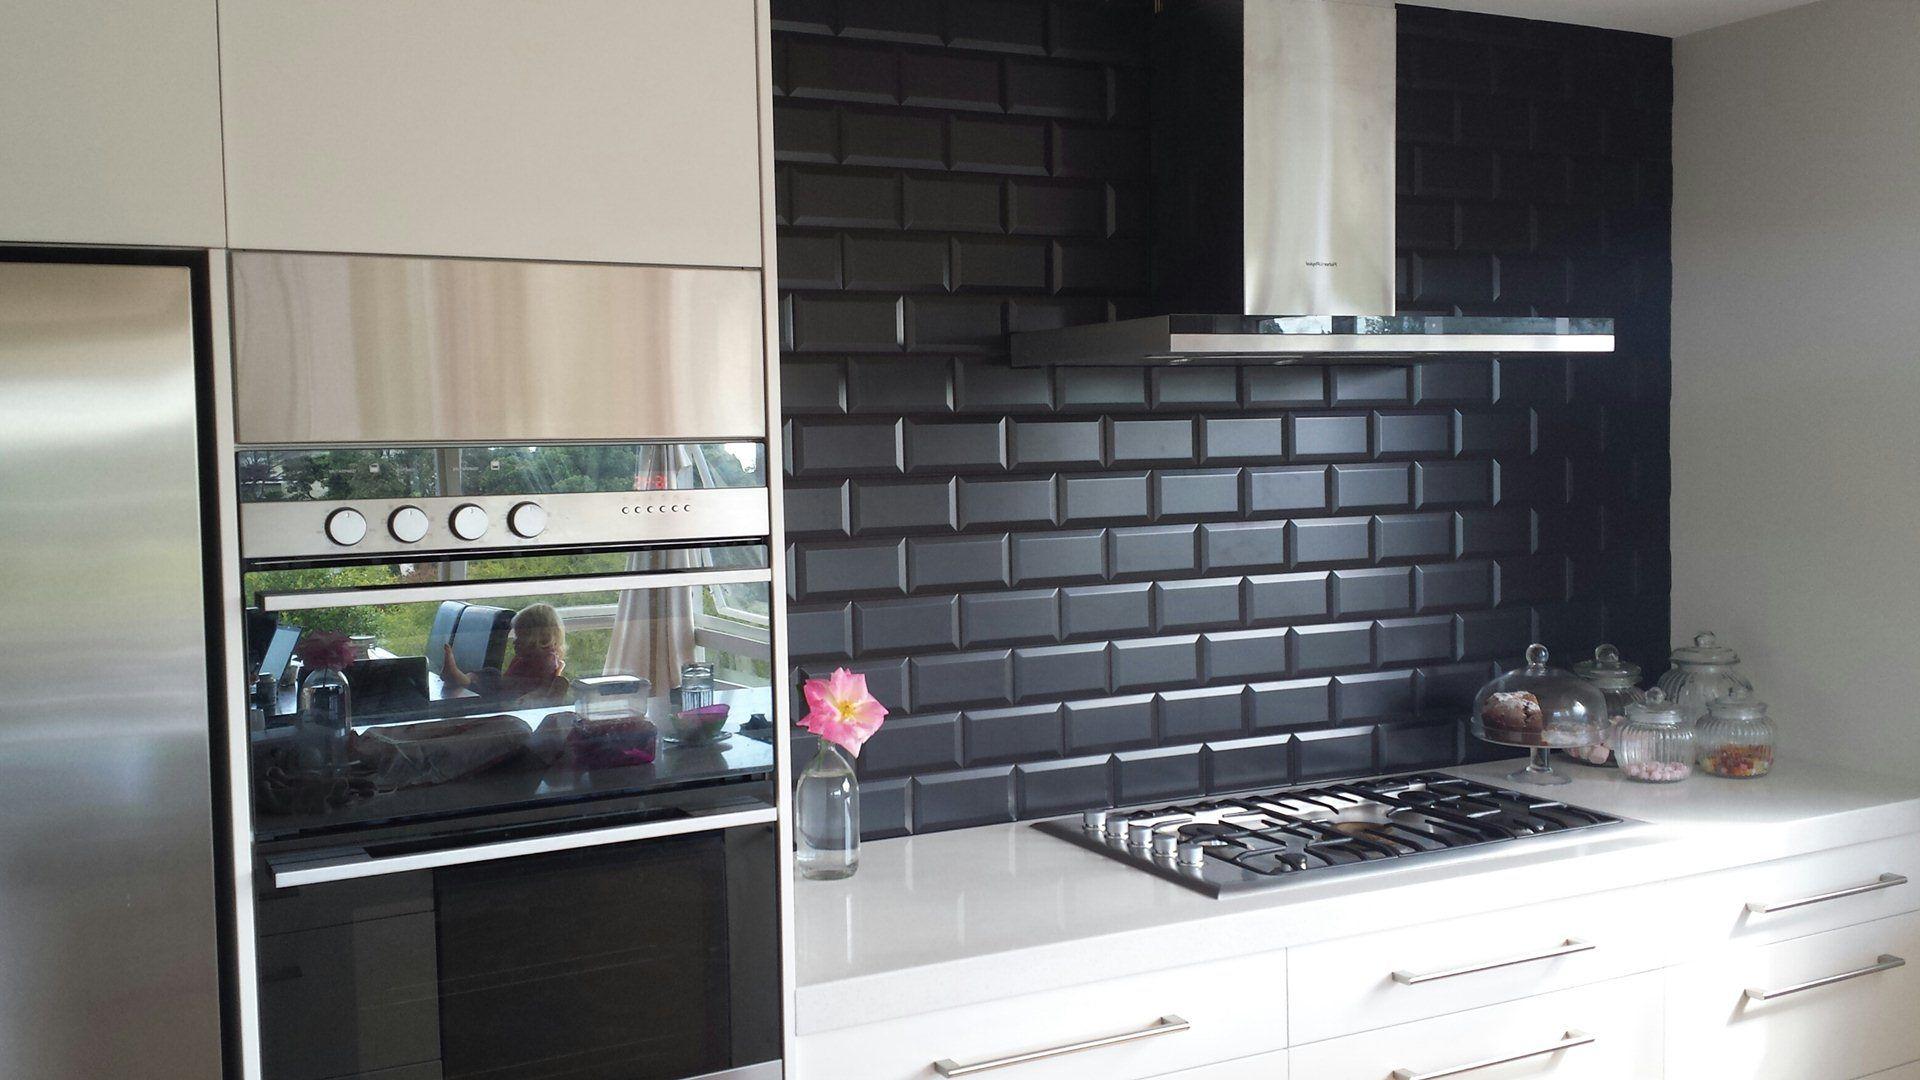 6 Outstanding Kitchen Backsplash Ideas That Make You Feel Like A